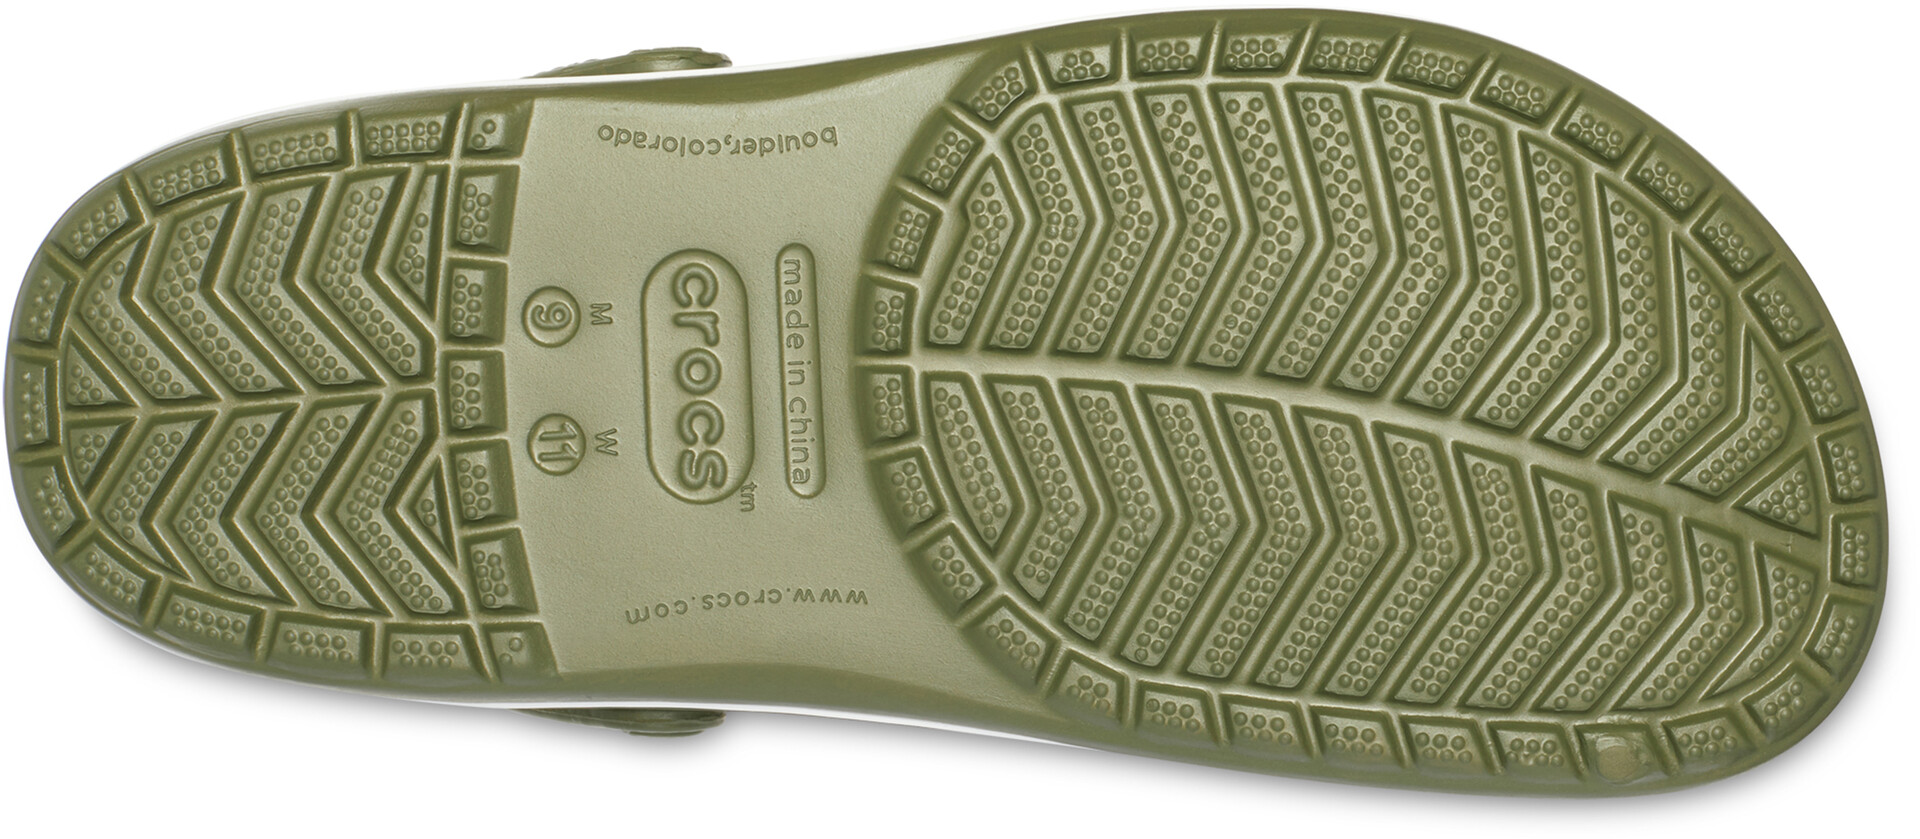 Crocs Crocband Clogs, army greenwhite